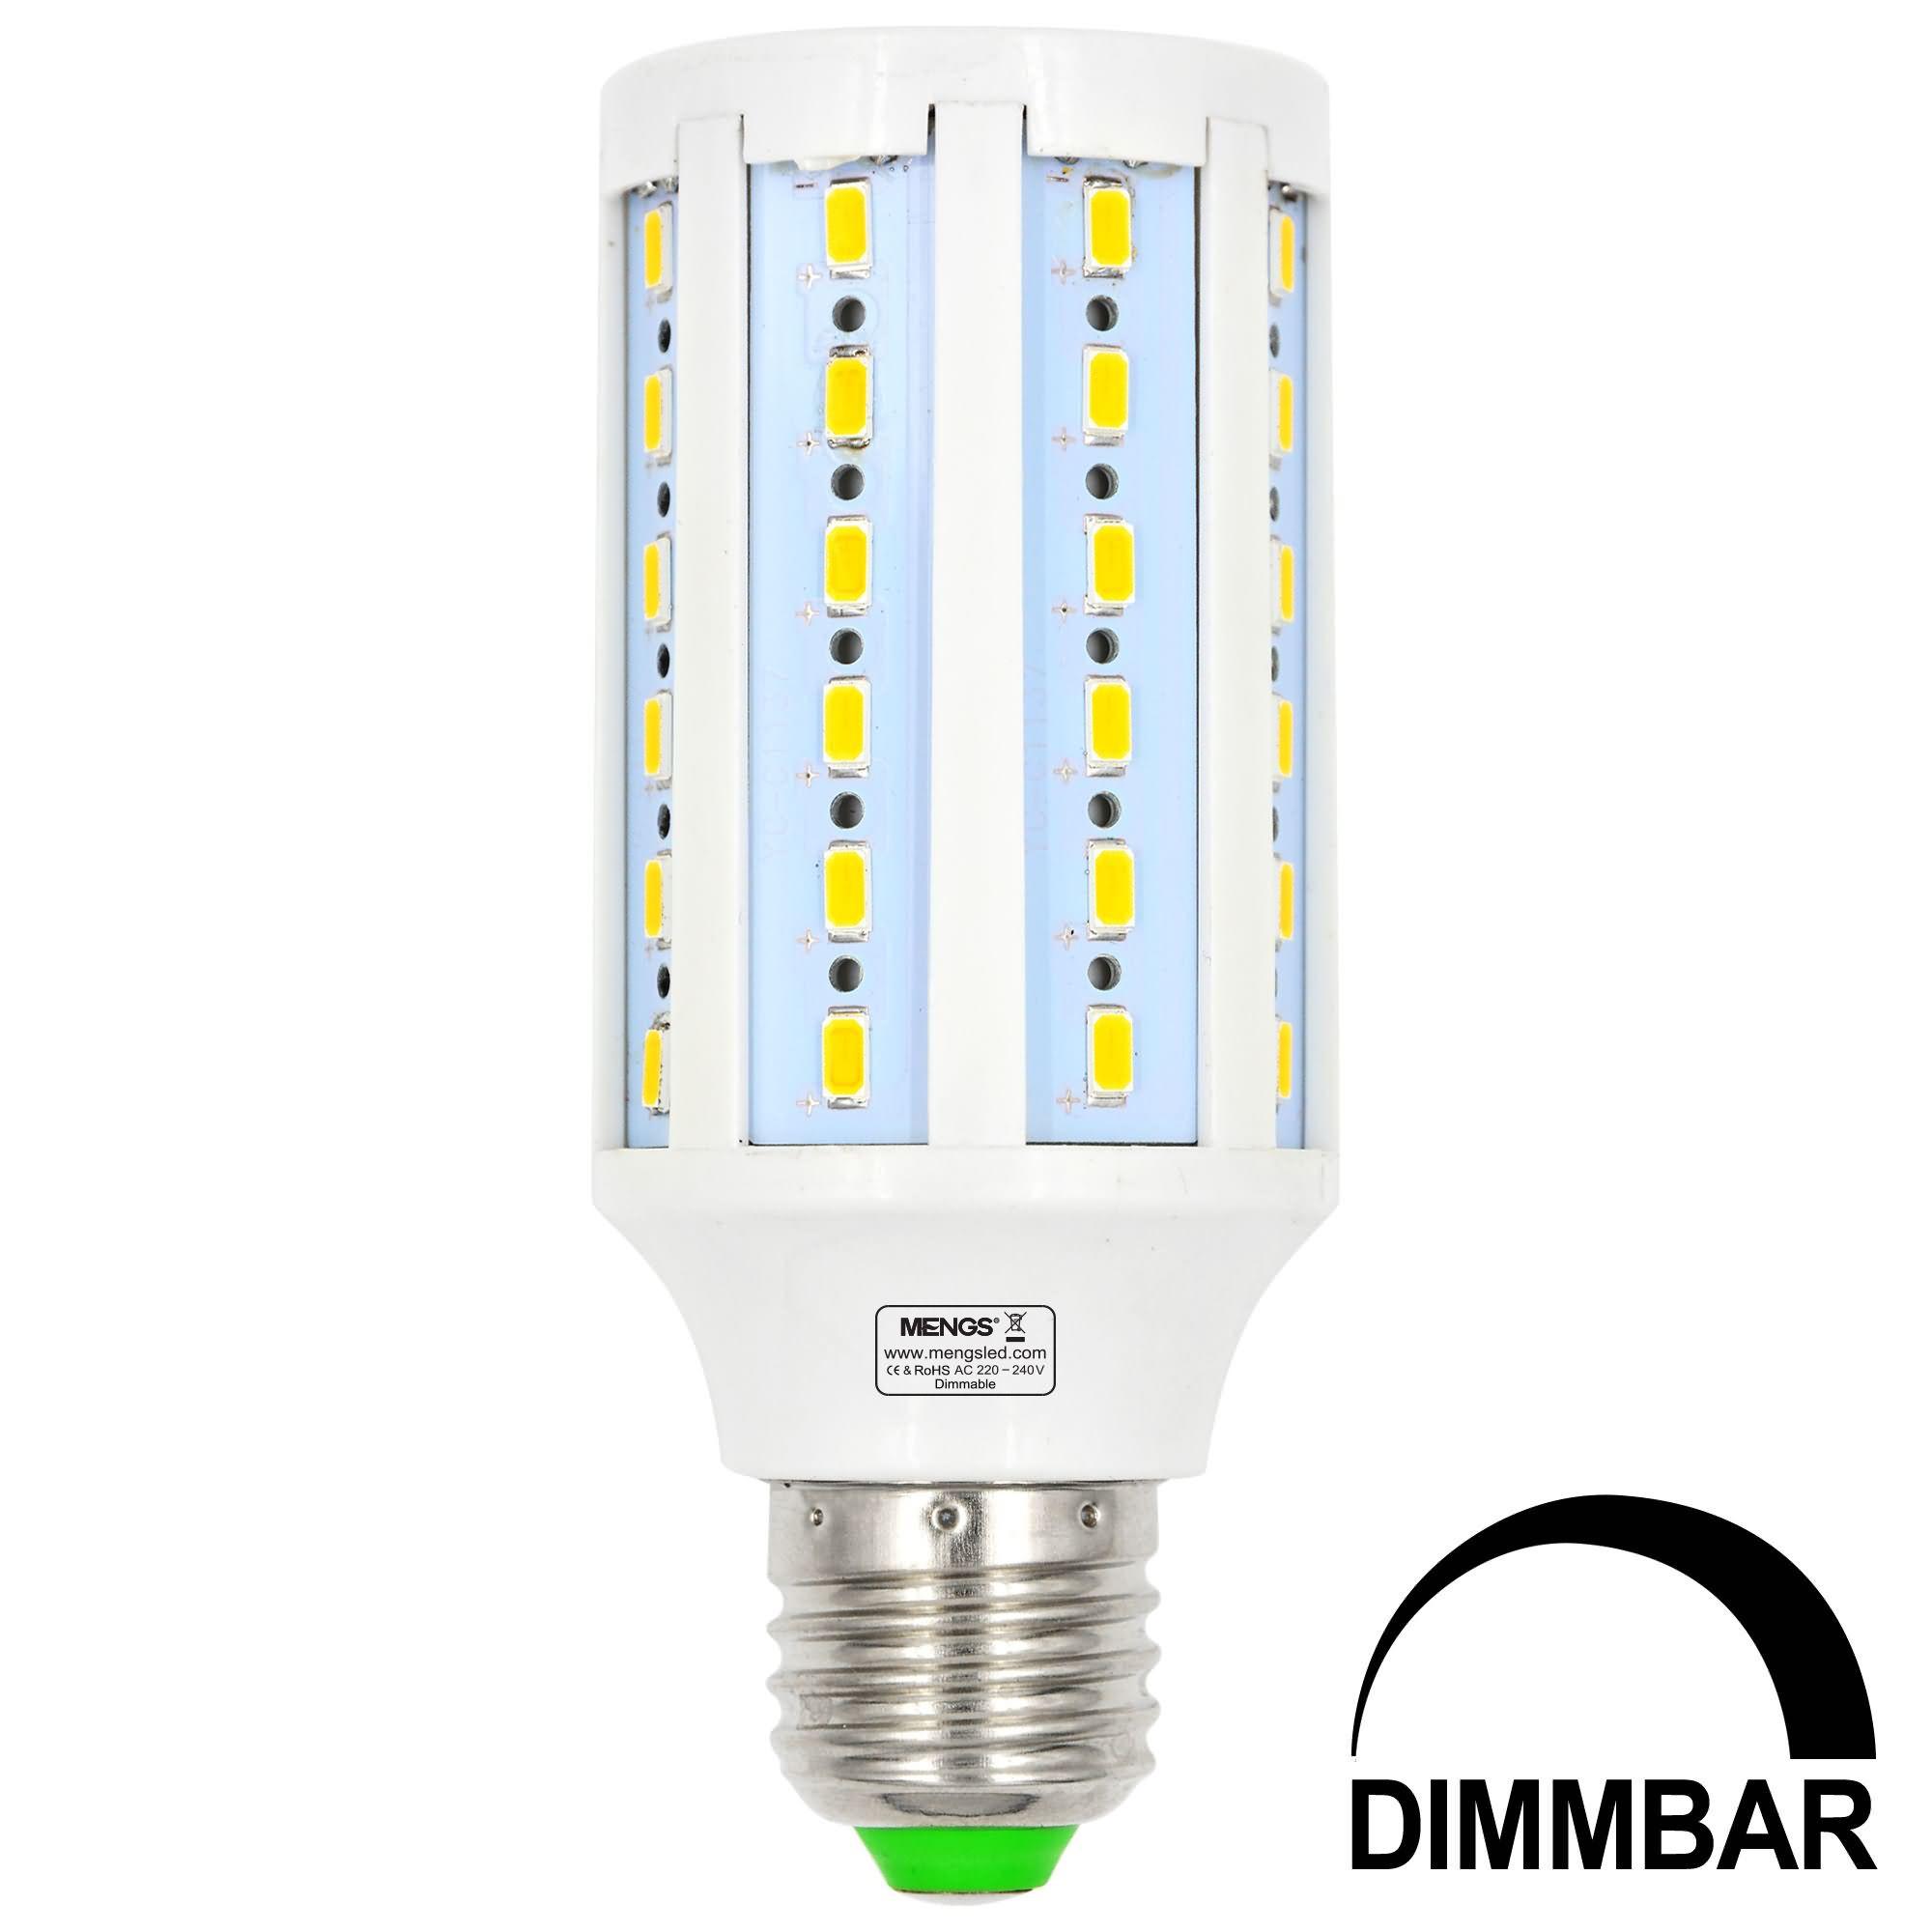 e27 15w led dimmable light 60x 5730 smd leds led bulb in warm white energy saving lamp led. Black Bedroom Furniture Sets. Home Design Ideas